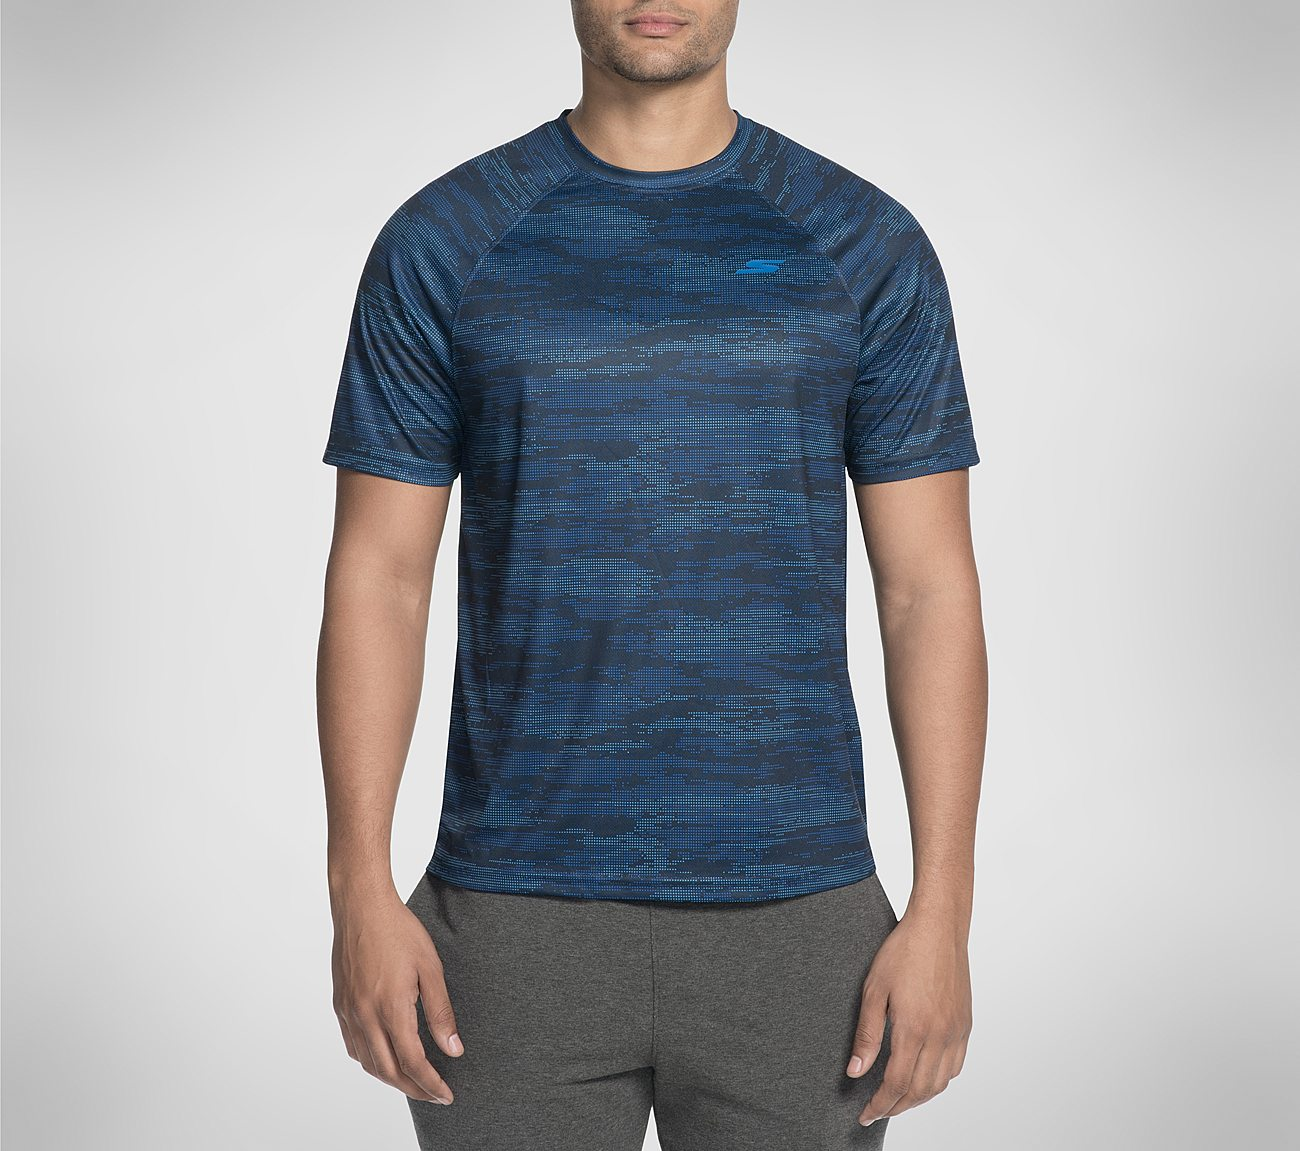 Seacliff Tee Shirt